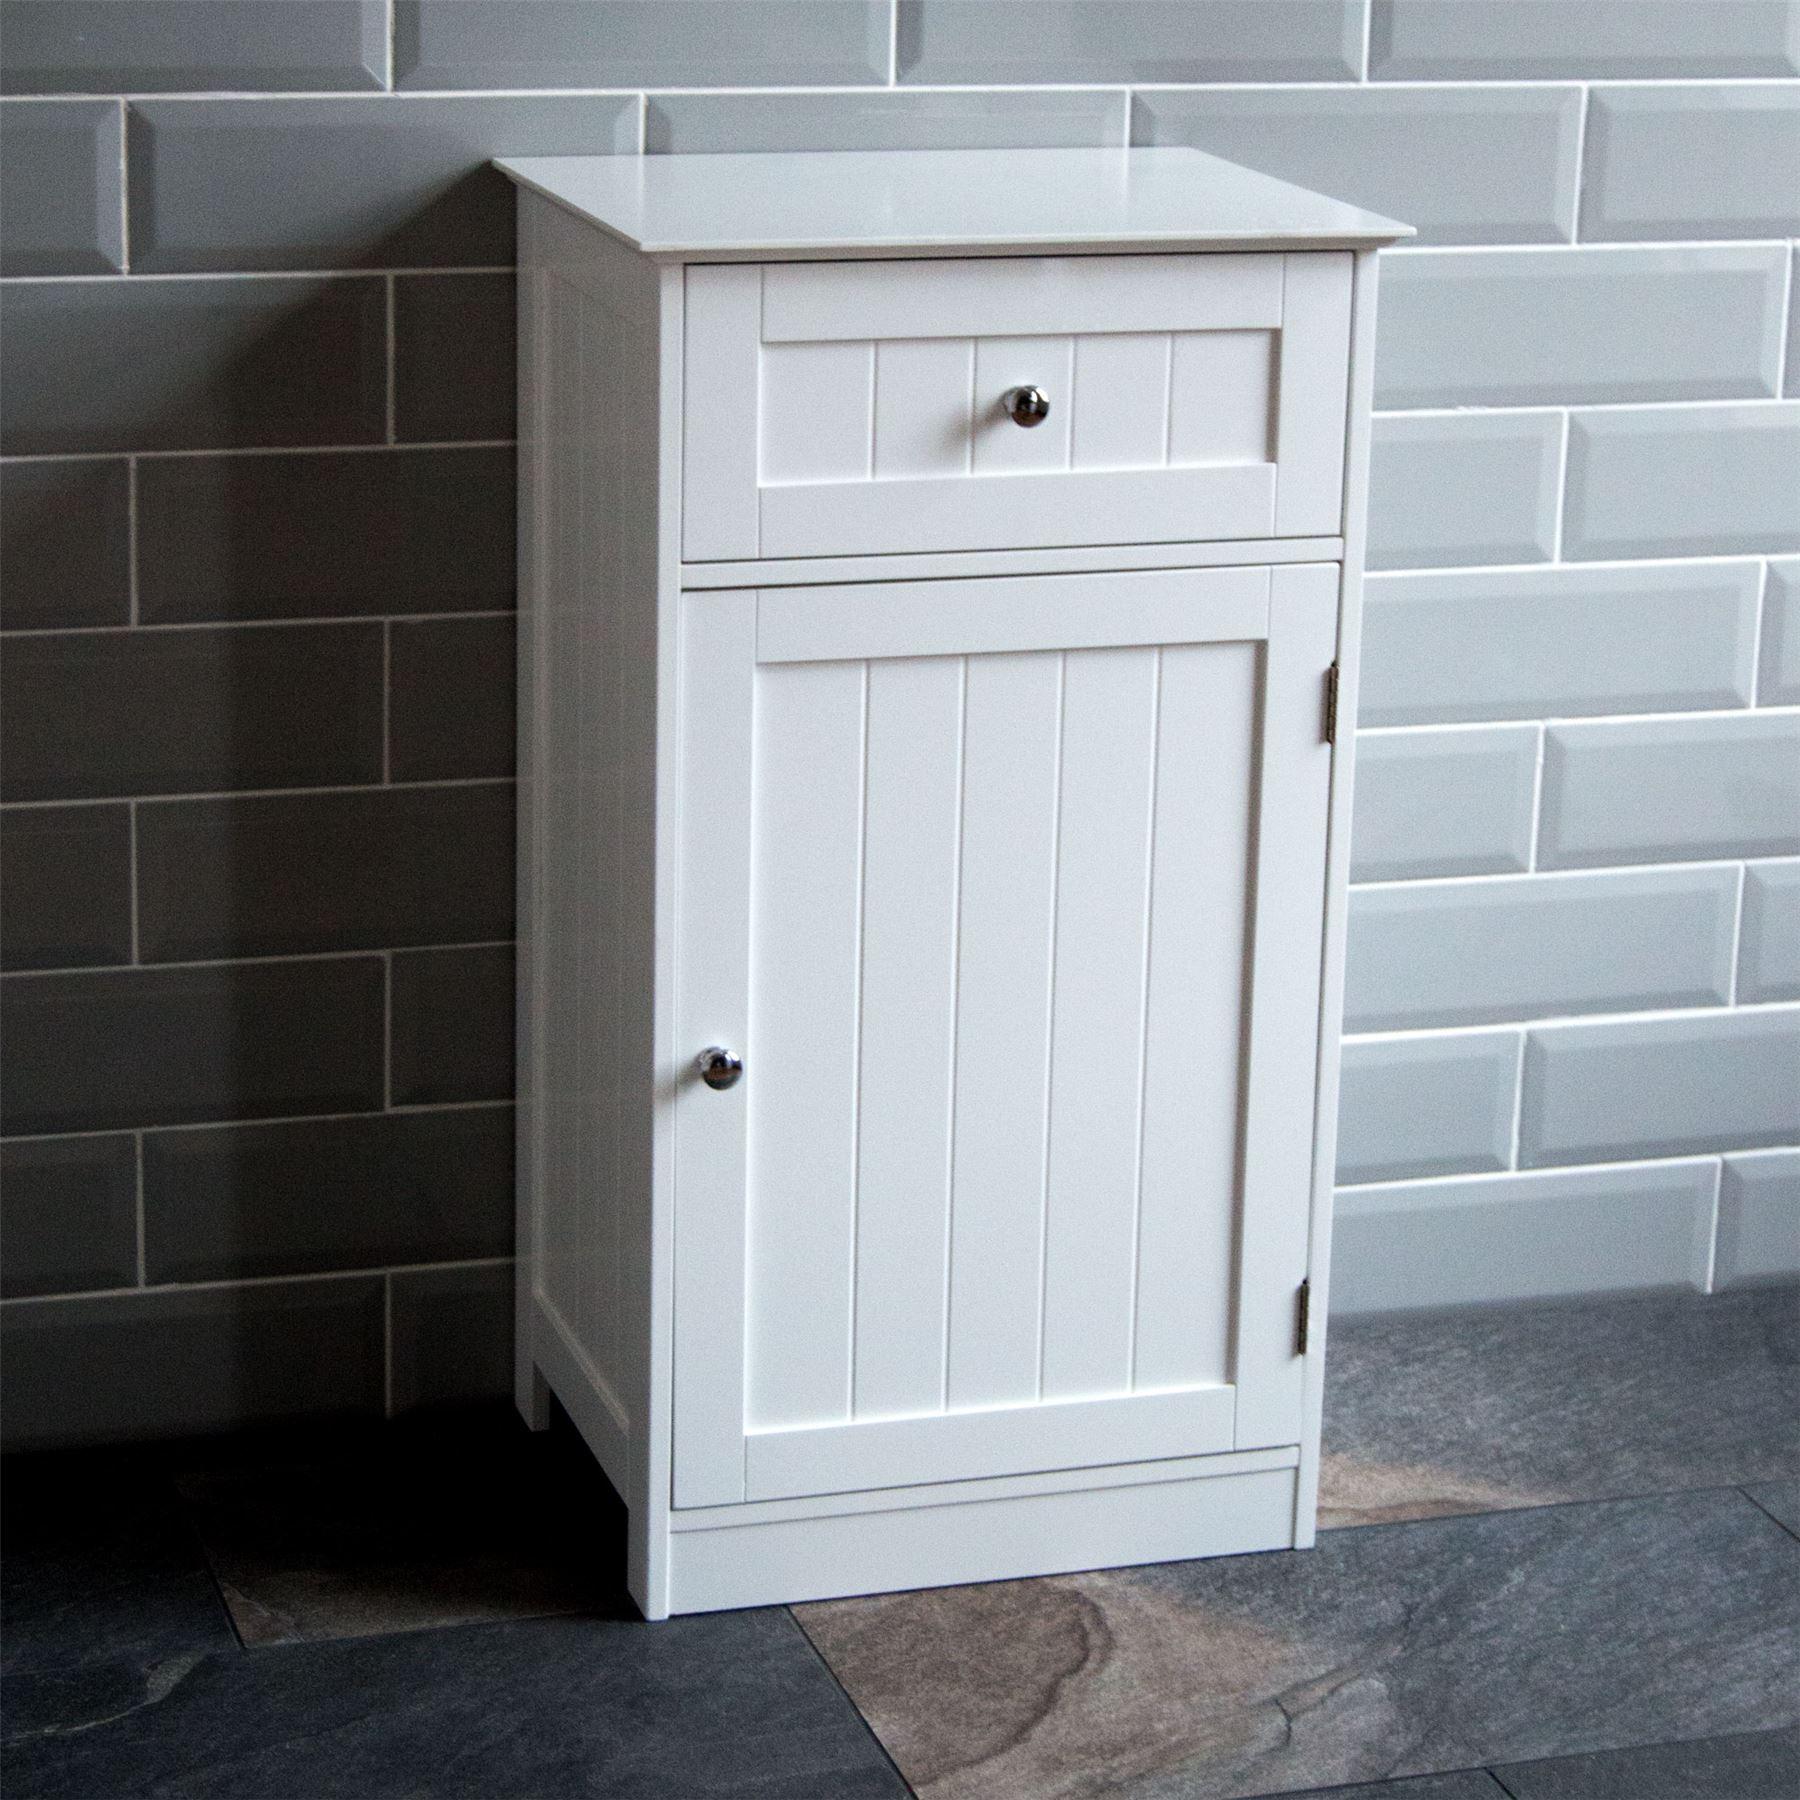 Bathroom Cabinet 1 Door 1 Drawer Freestanding Storage Unit Wood inside sizing 1800 X 1800